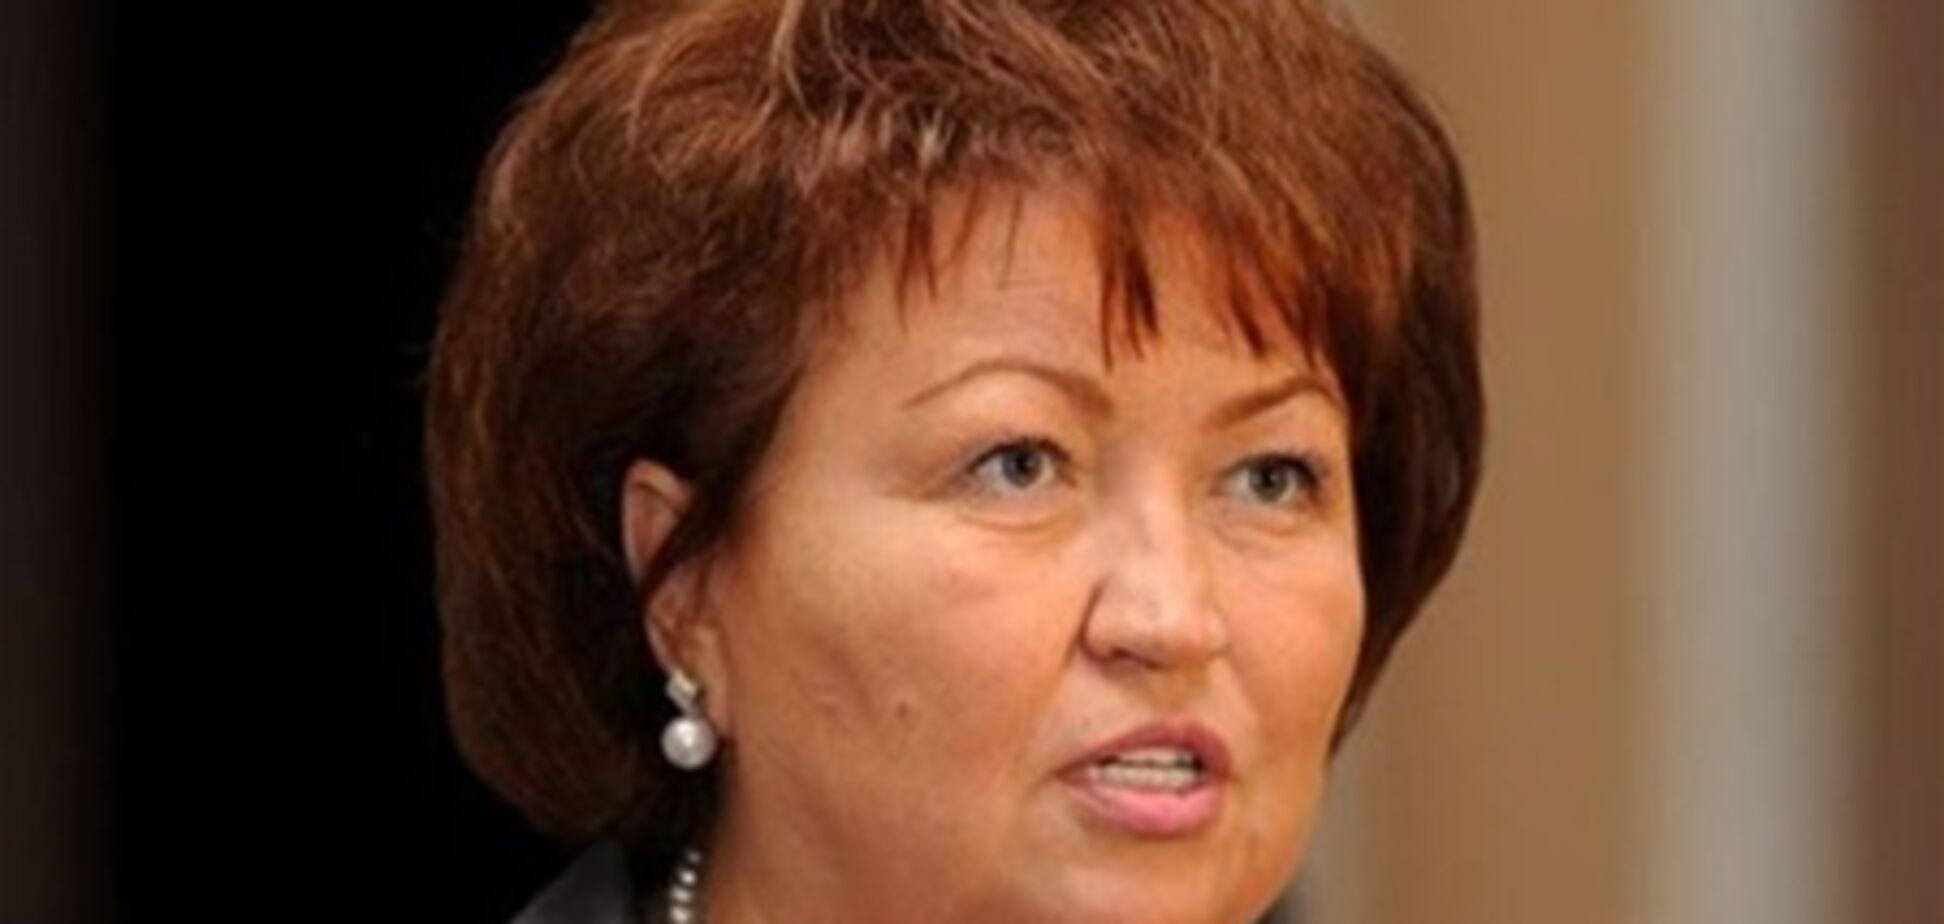 Бахтєєва: Україна не готова до закону про посмертне донорство